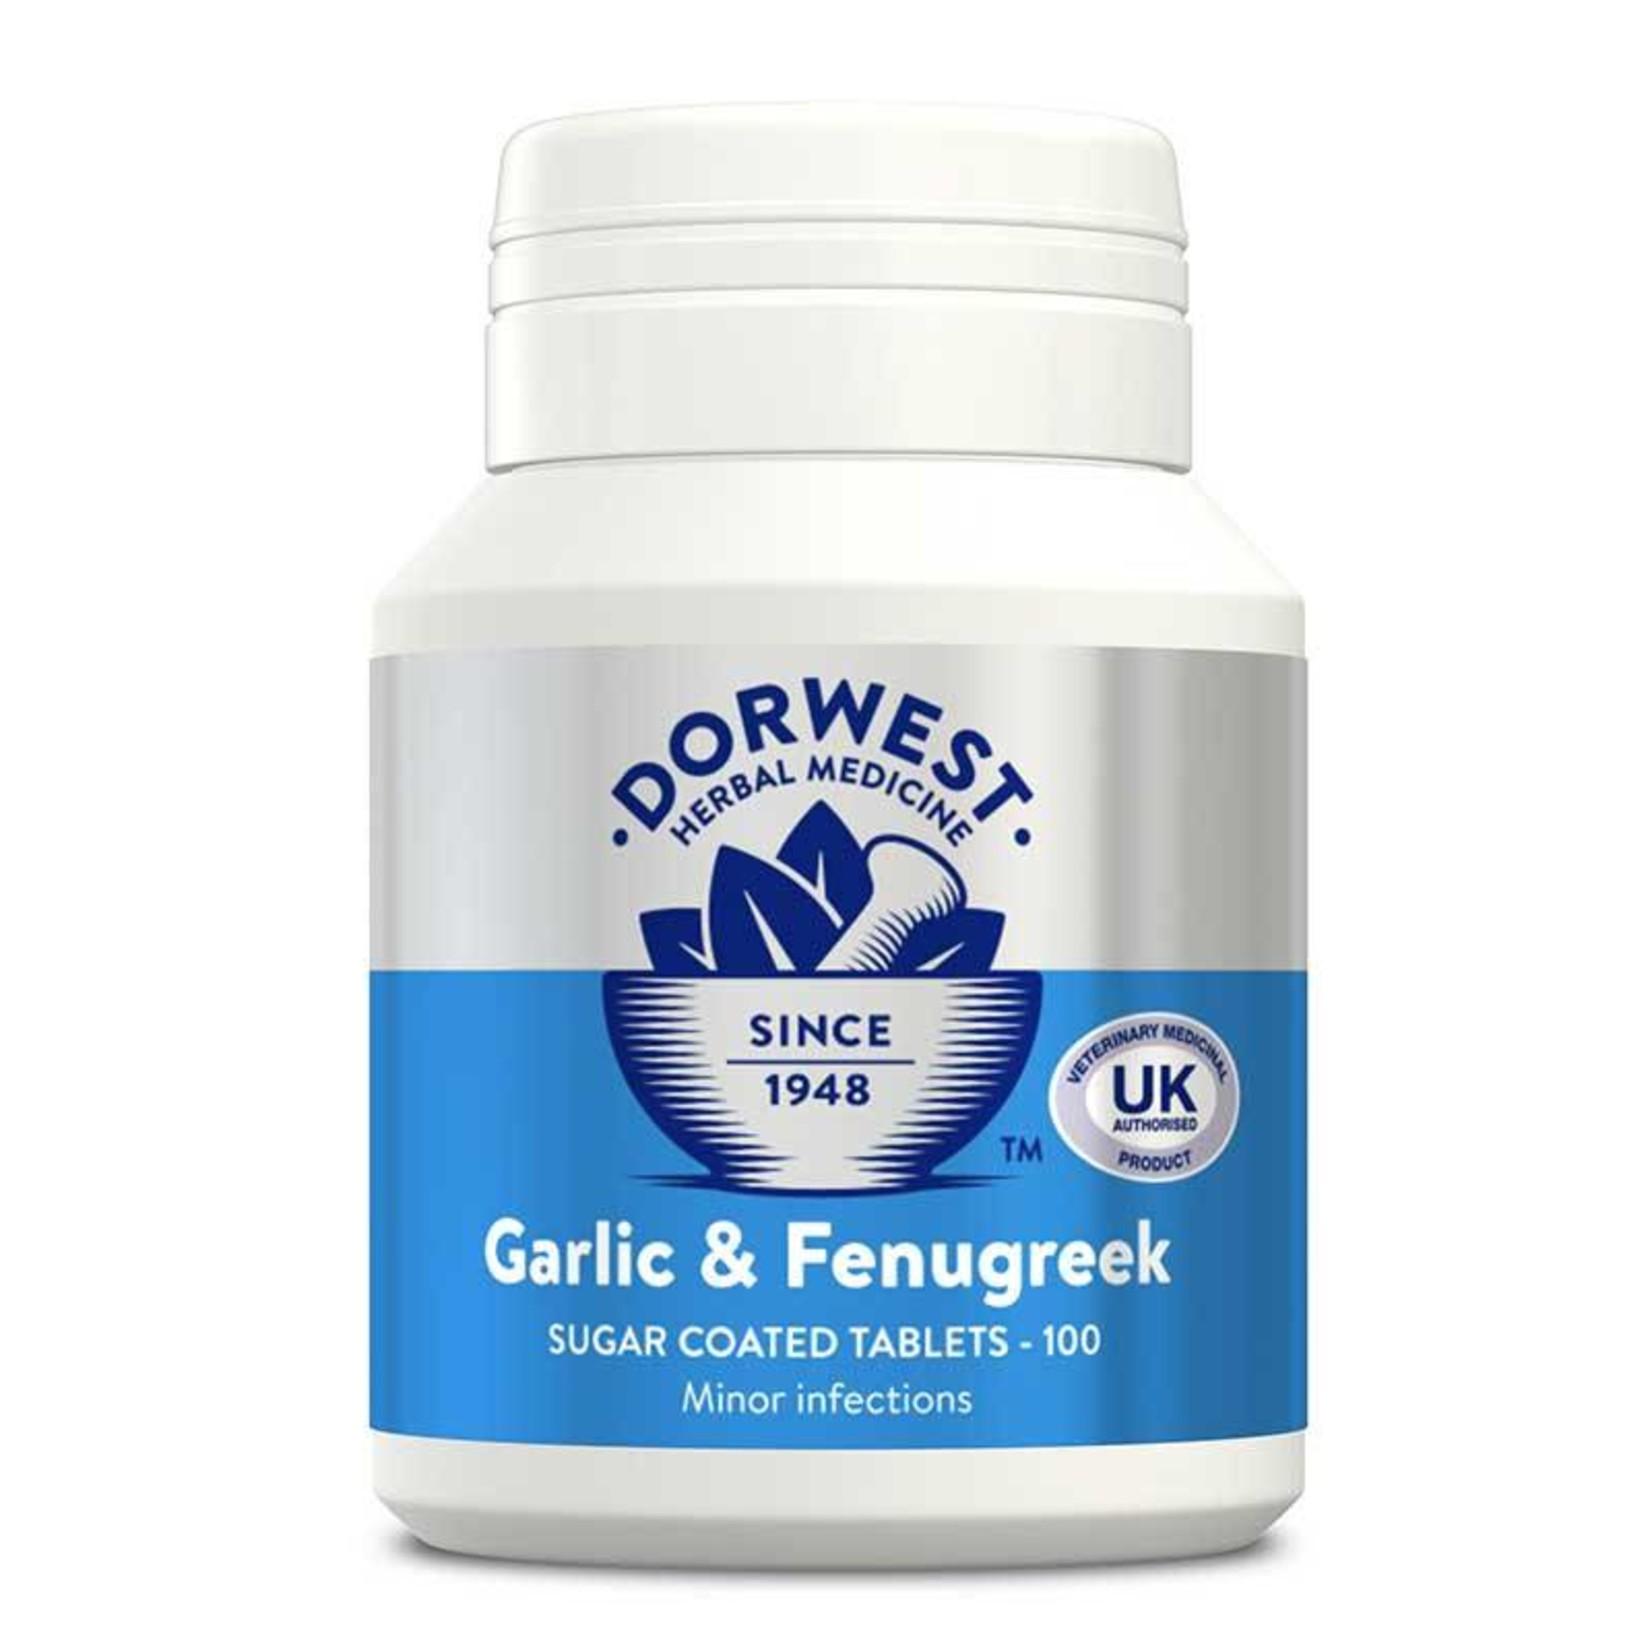 Dorwest Garlic & Fenugreek Tablets